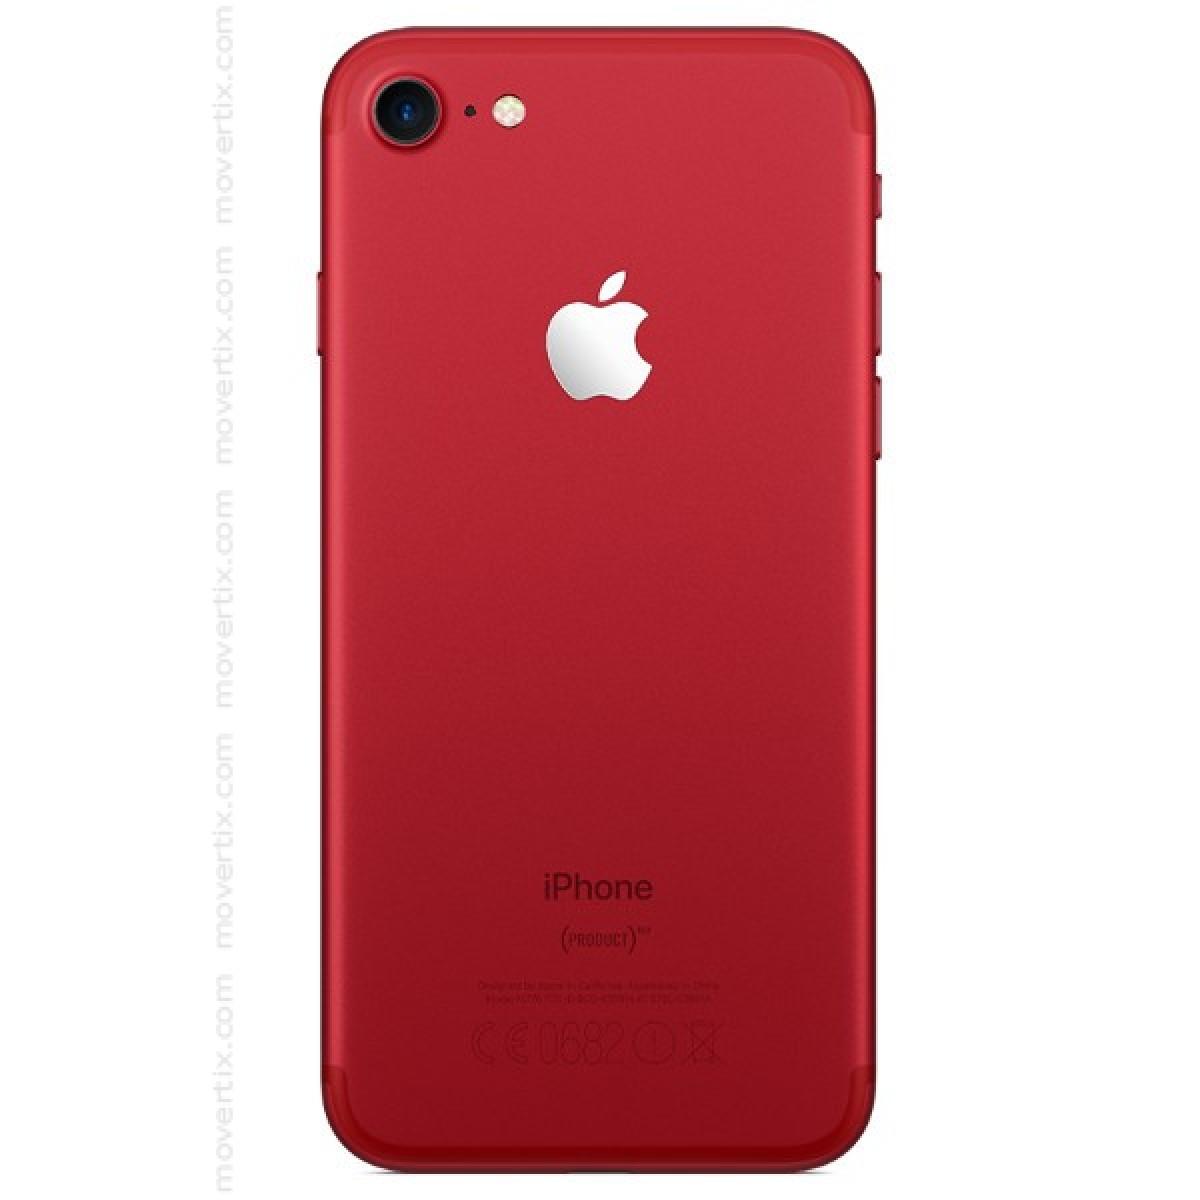 apple iphone 7 rouge avec 128go 0190198360359 movertix. Black Bedroom Furniture Sets. Home Design Ideas